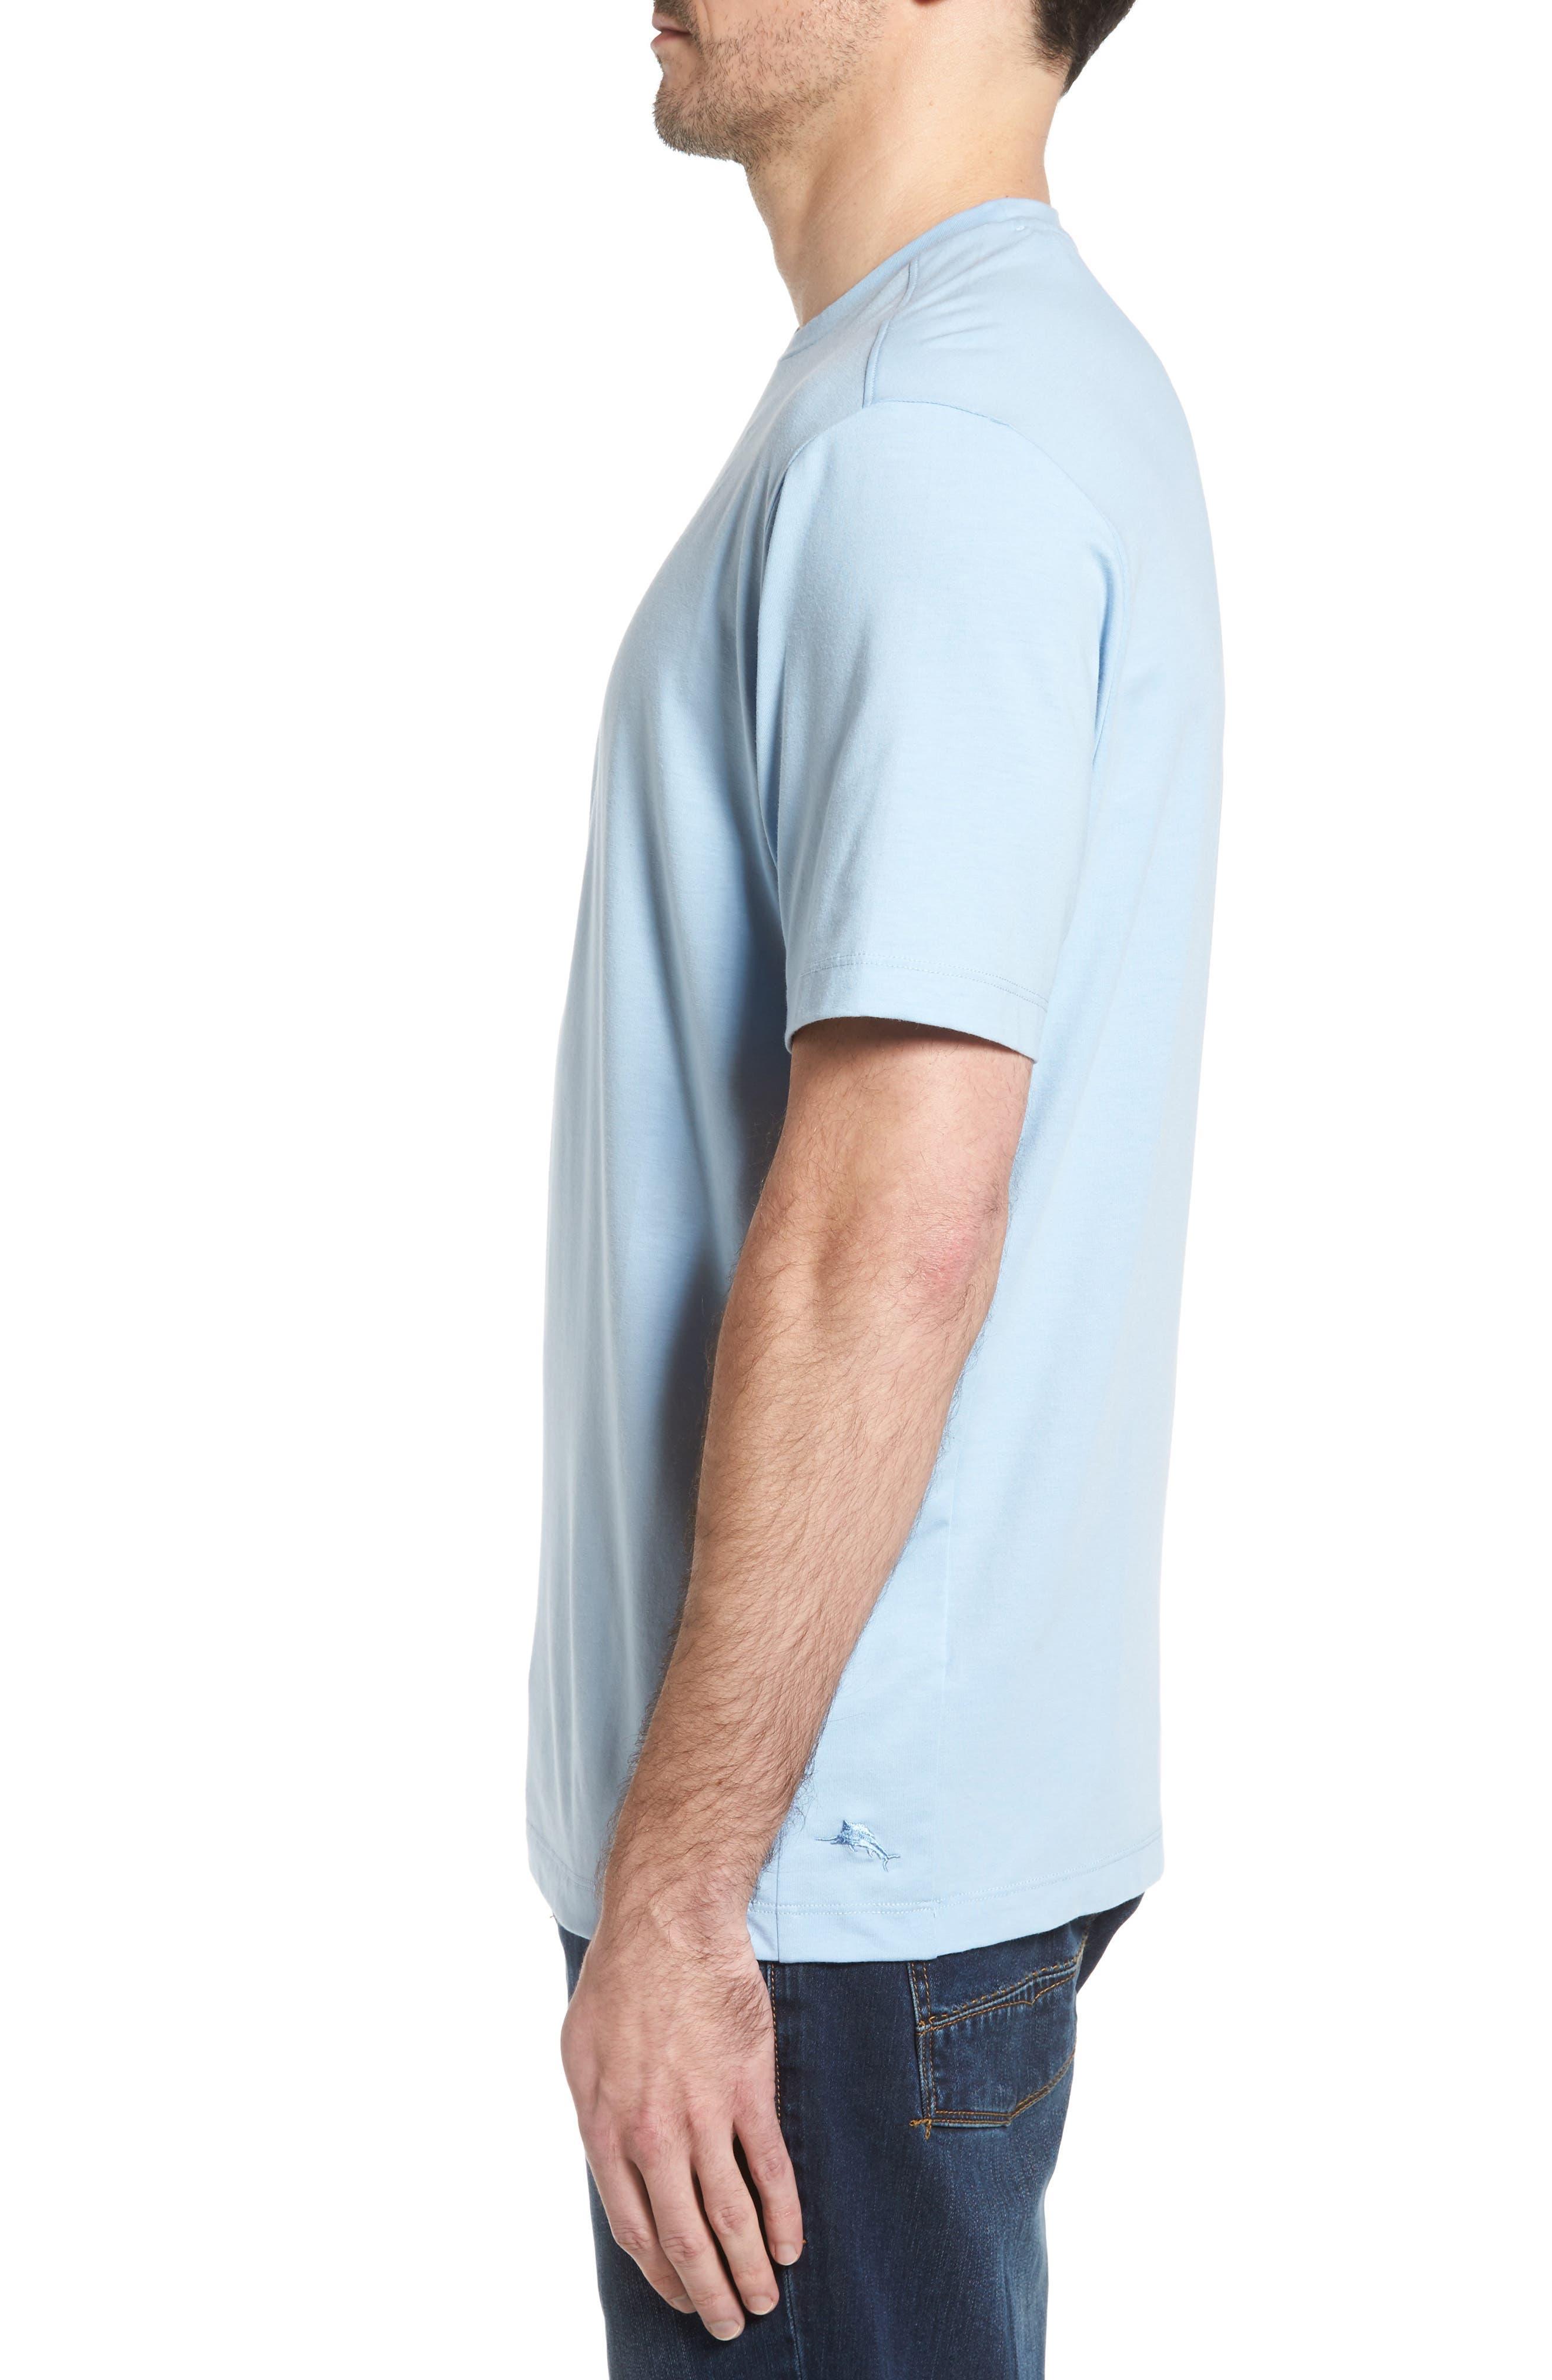 Tropicool T-Shirt,                             Alternate thumbnail 27, color,